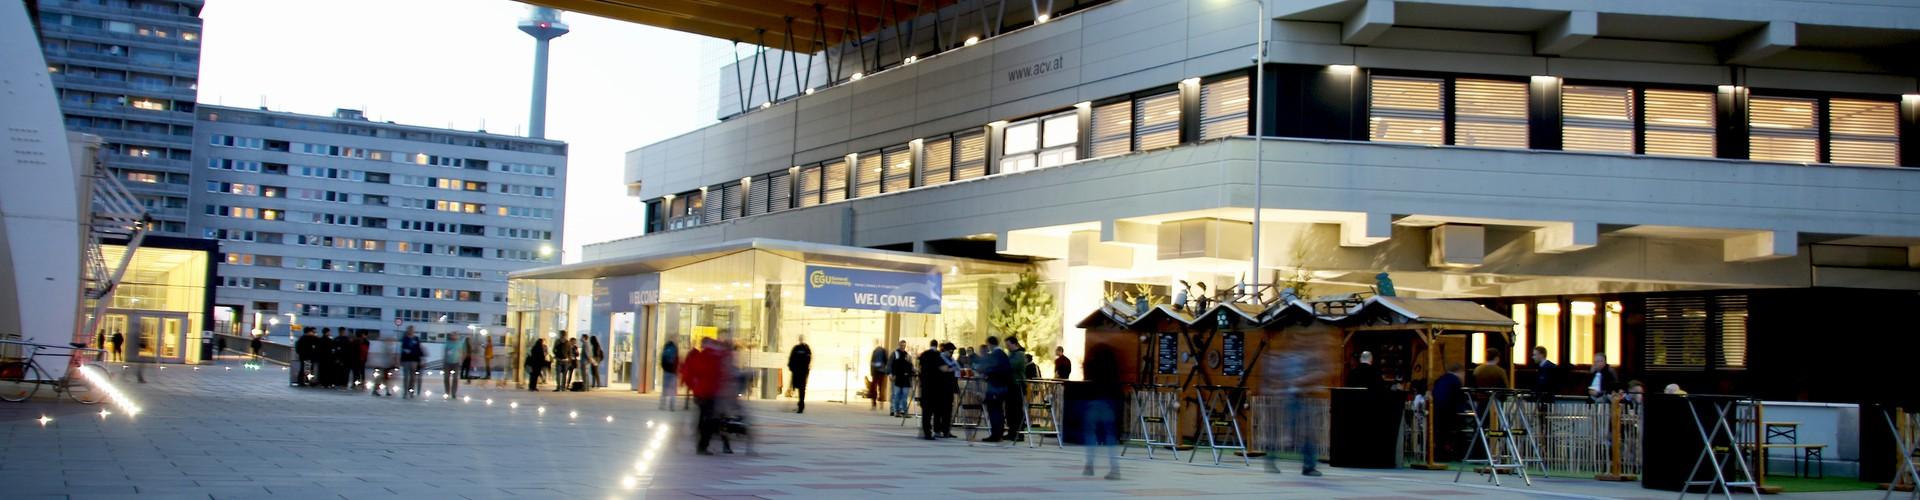 Evening at the Austria Center Vienna during the EGU General Assembly (Credit: Keri McNamara/EGU)